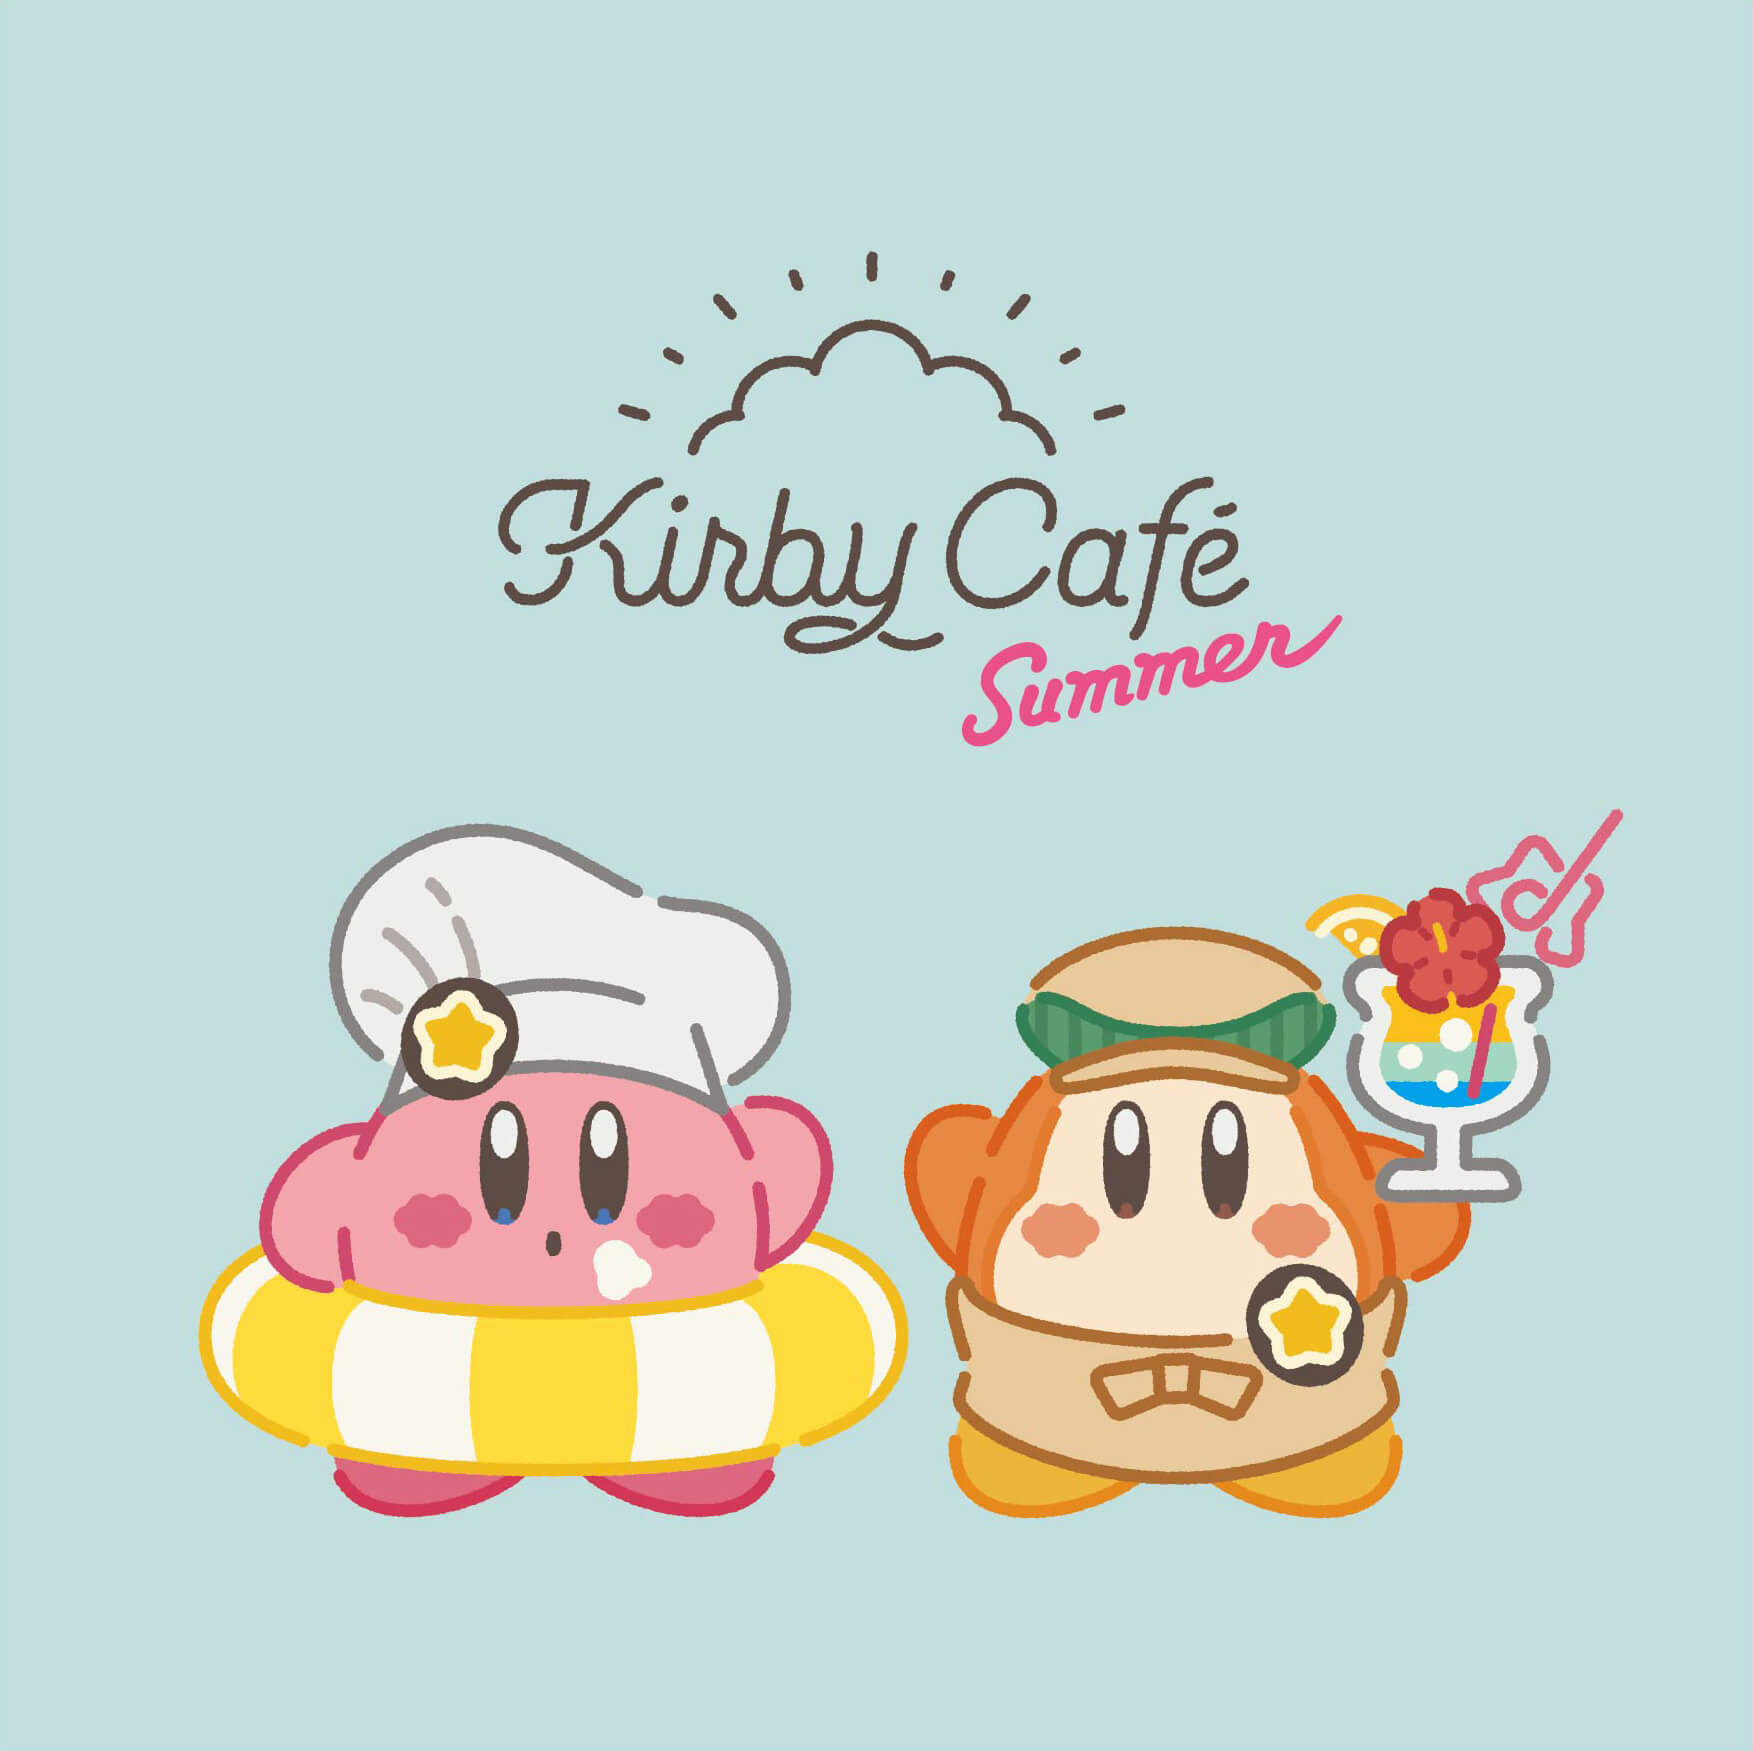 kirby-cafe-%e3%82%ab%e3%83%bc%e3%83%93%e3%83%bc%e3%82%ab%e3%83%95%e3%82%a7%e3%80%80main-2